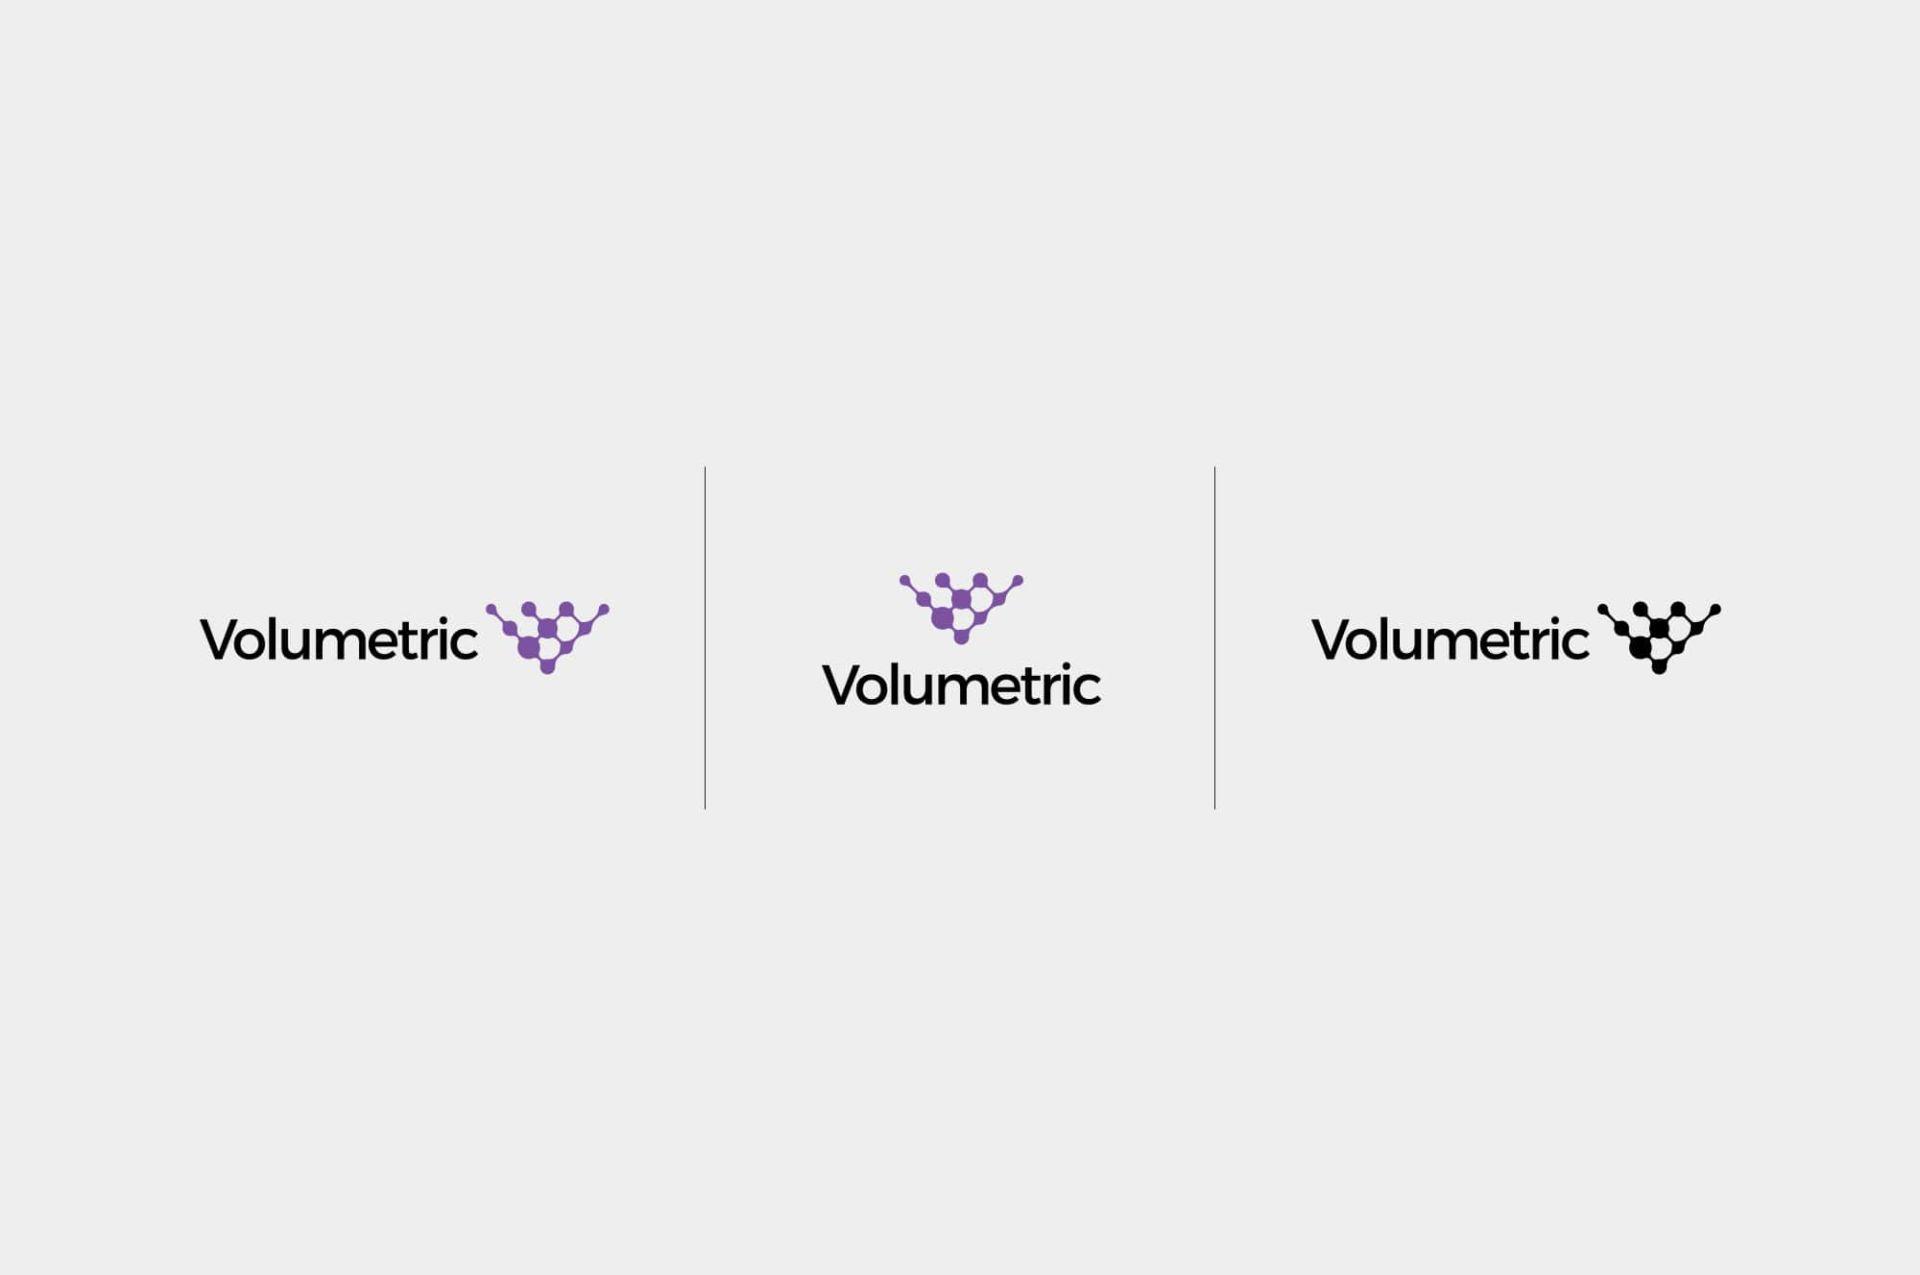 Volumetric_Logo_Variations